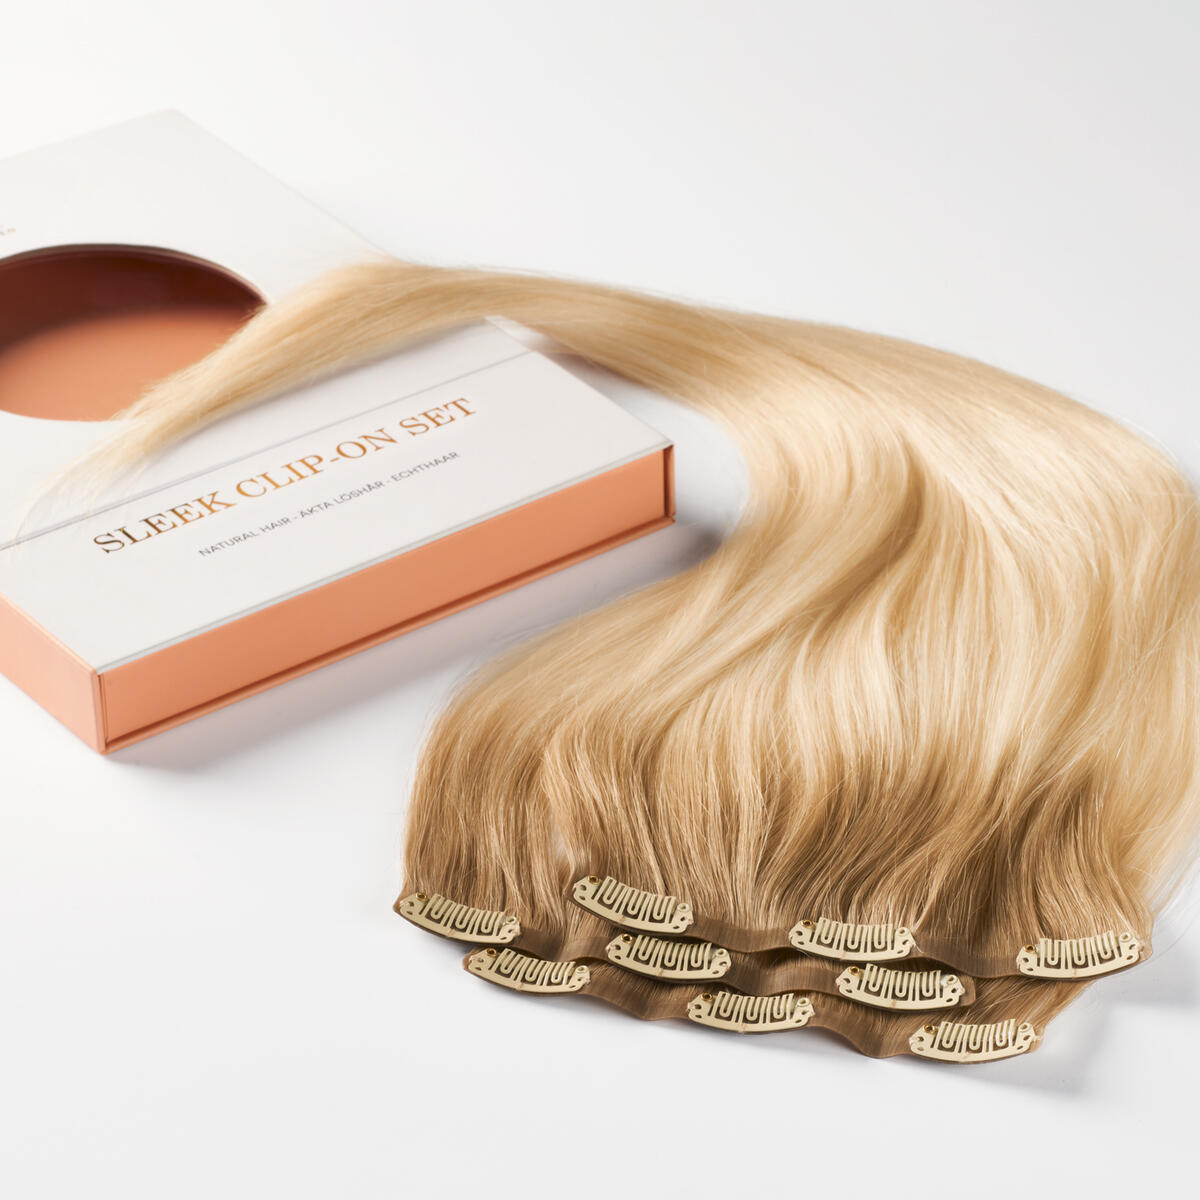 Sleek Clip-on set 3 pieces B7.3/10.10 Cool Platinum Blonde Balayage 50 cm